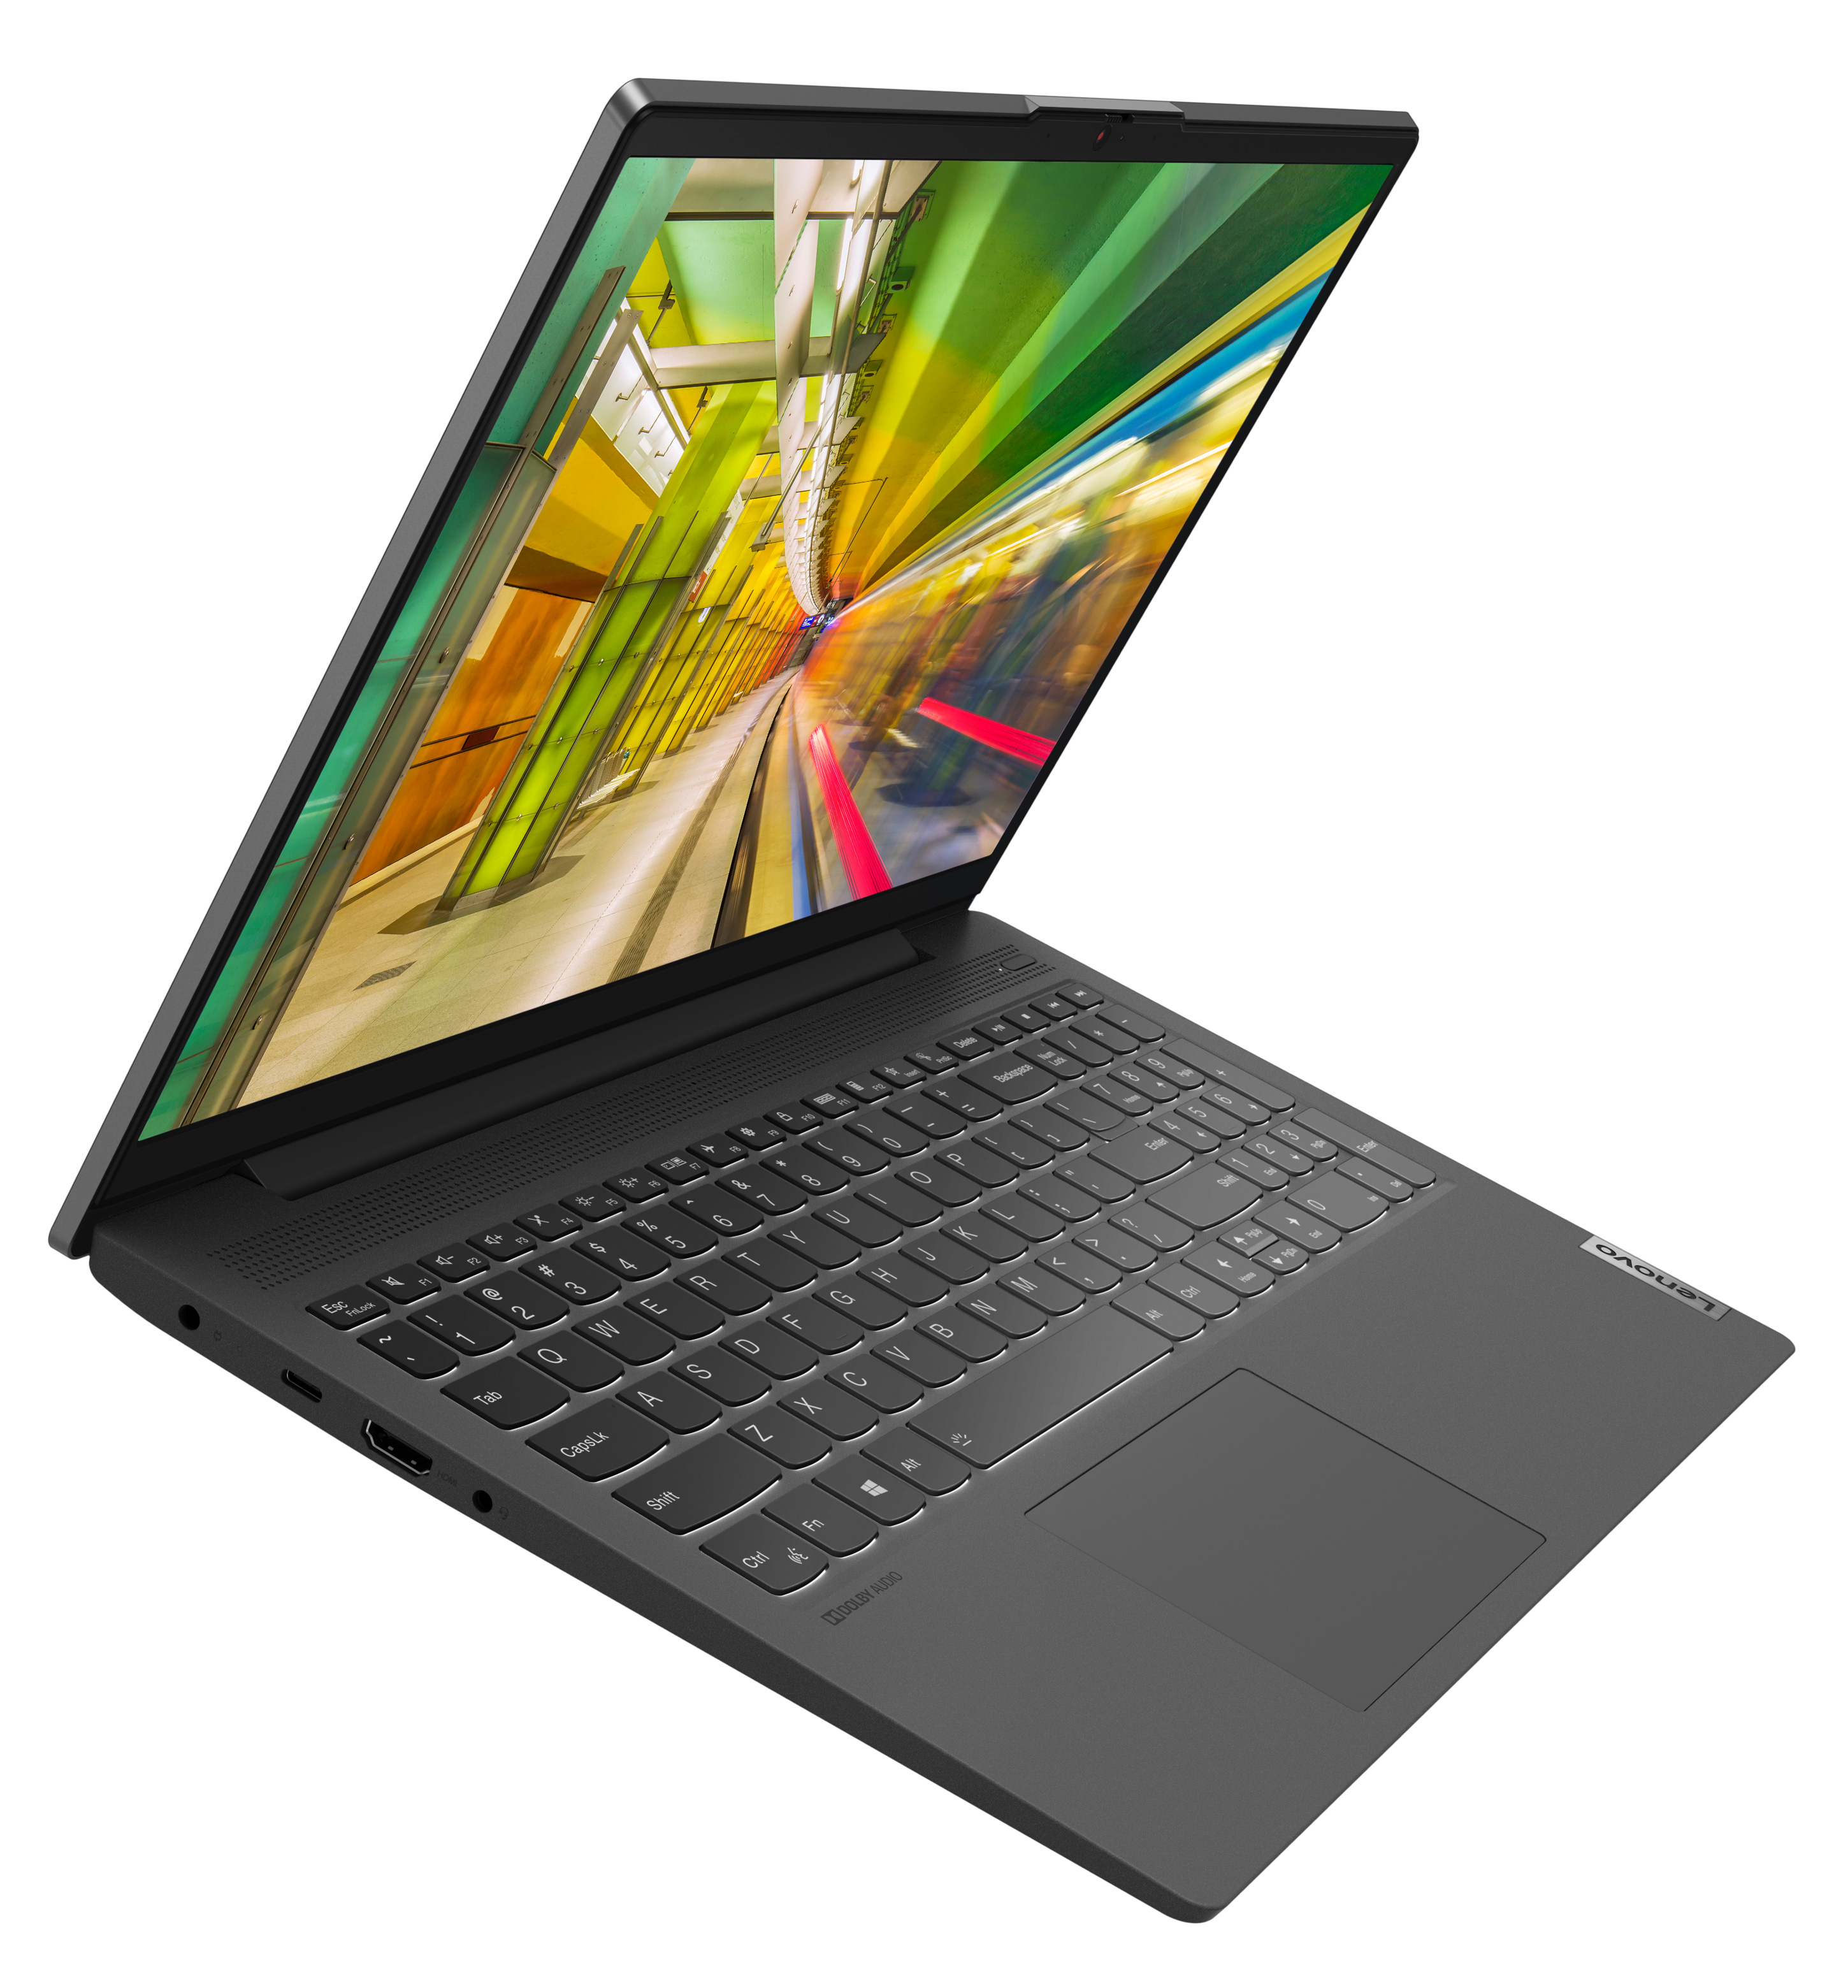 Фото  Ноутбук Lenovo ideapad 5i 15IIL05 Graphite Grey (81YK006HRE)